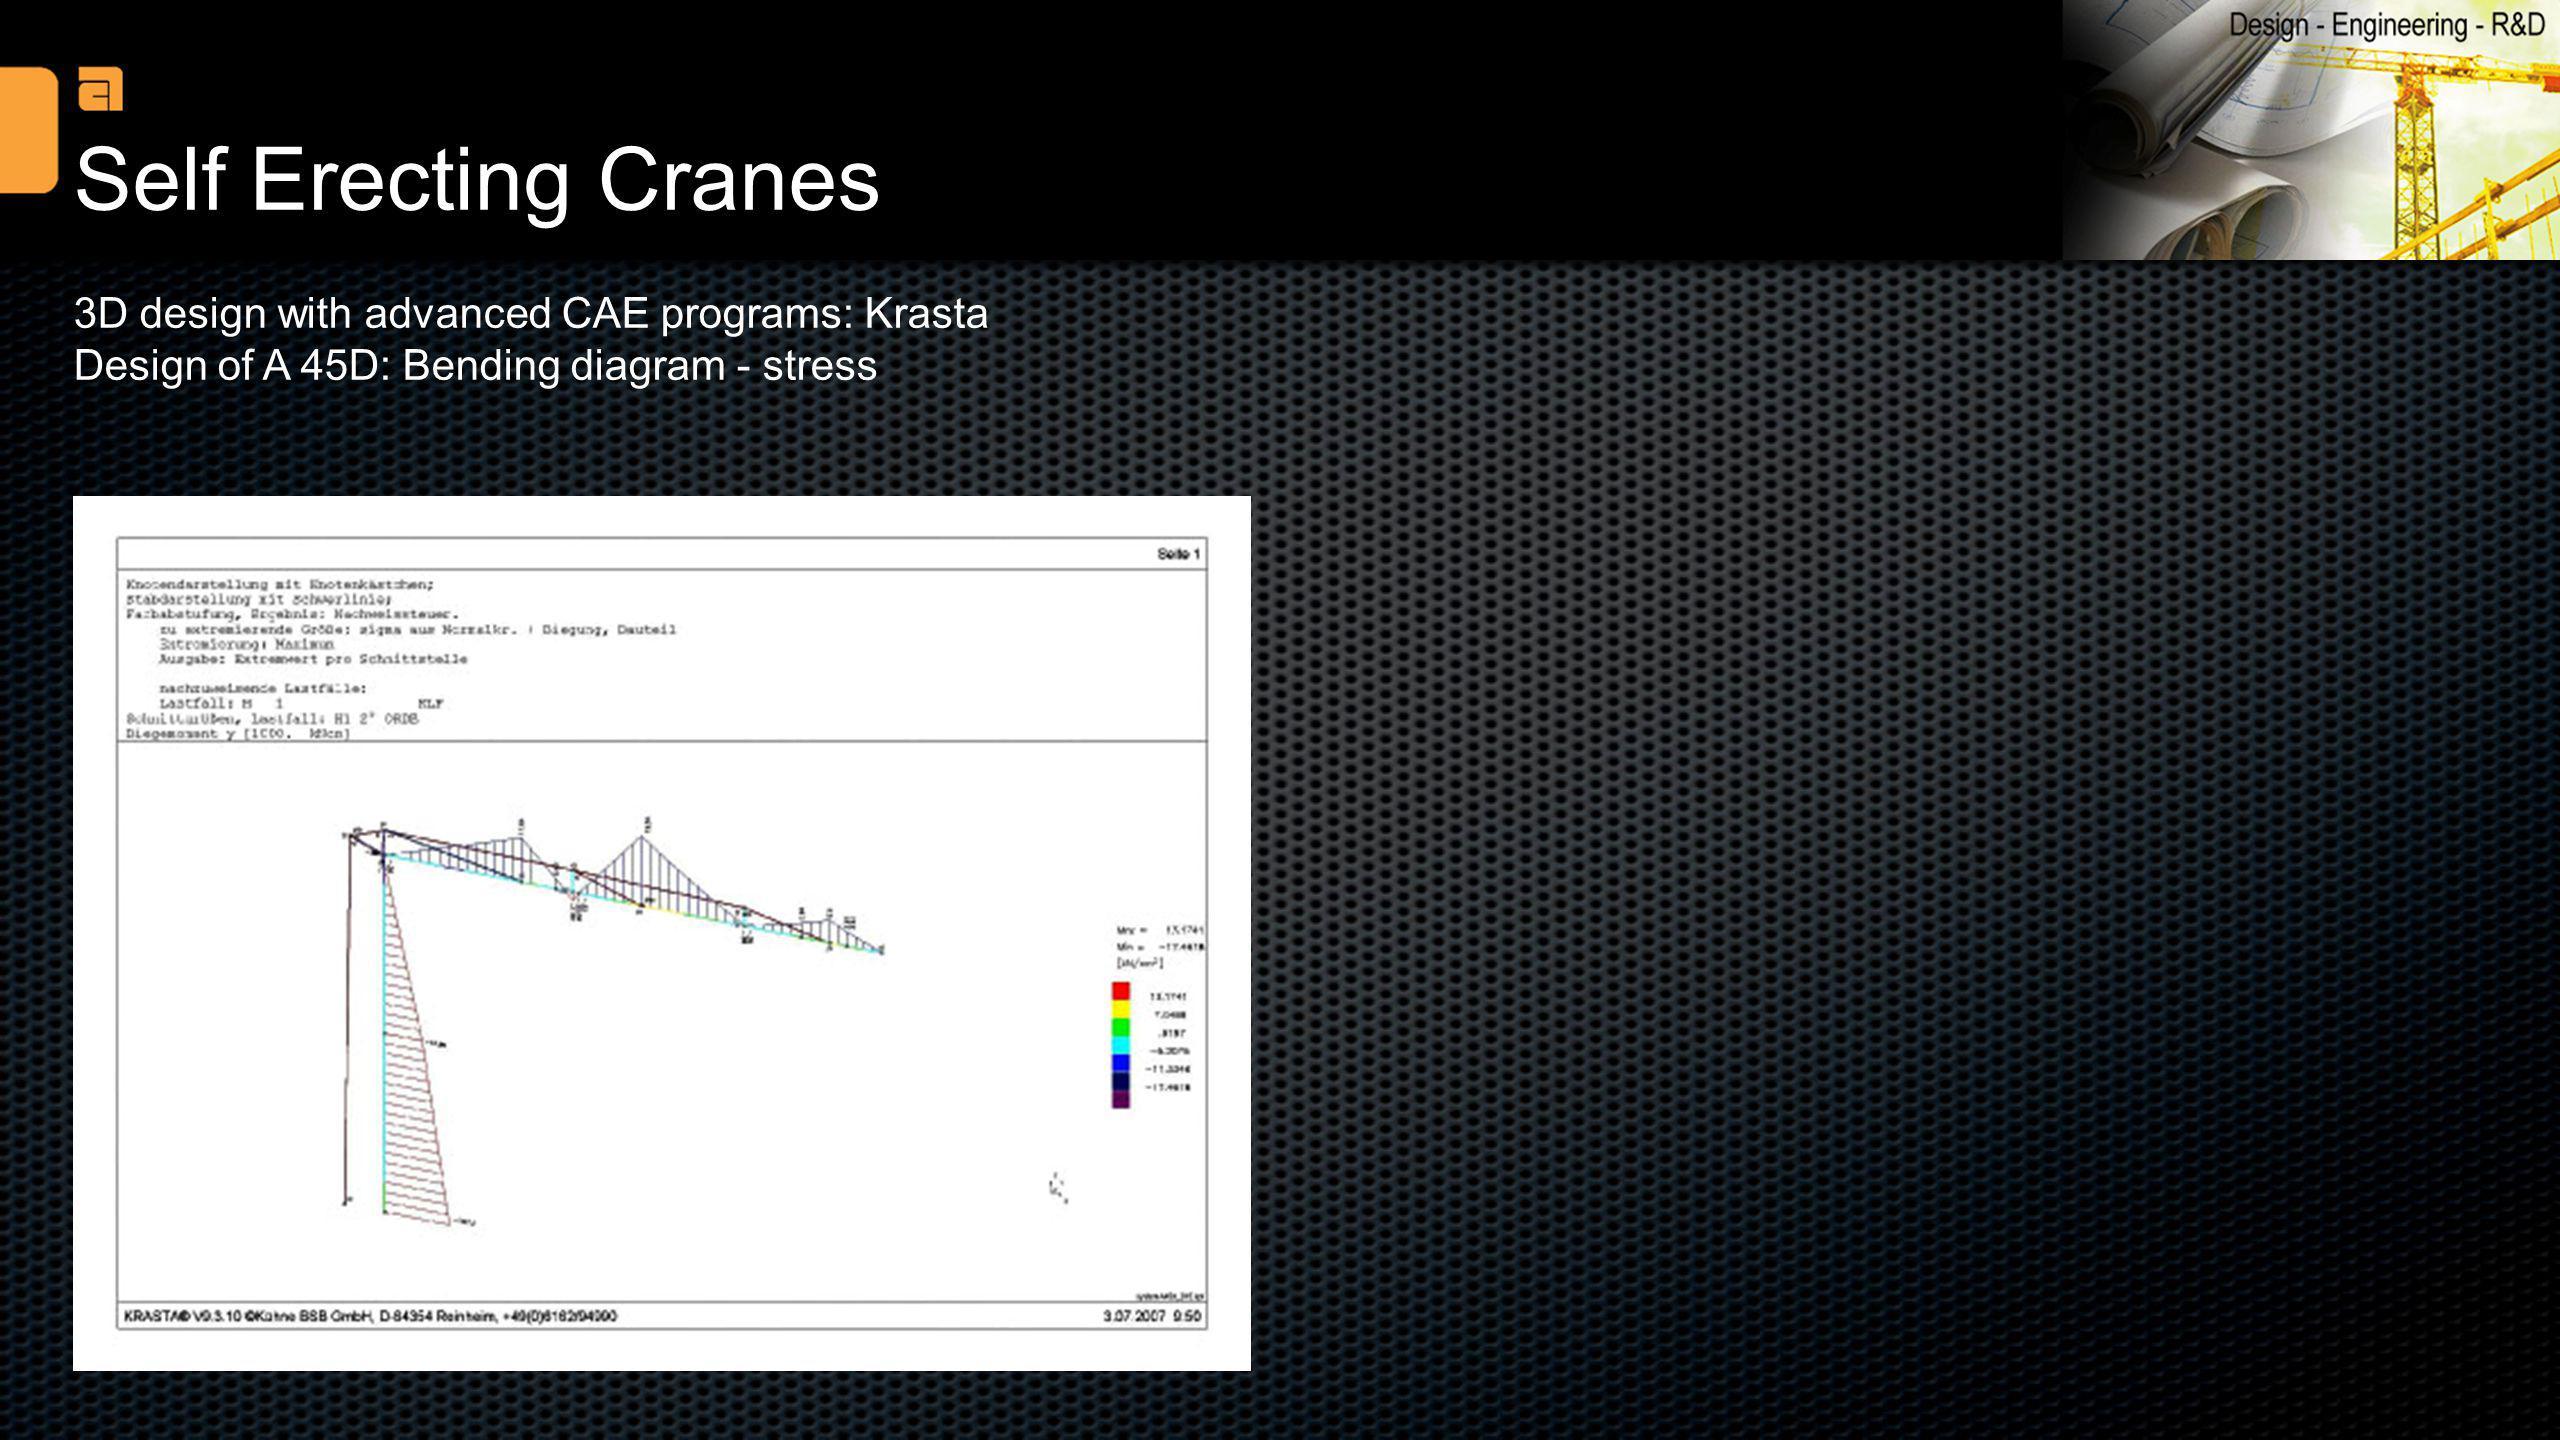 Self Erecting Cranes 3D design with advanced CAE programs: Krasta